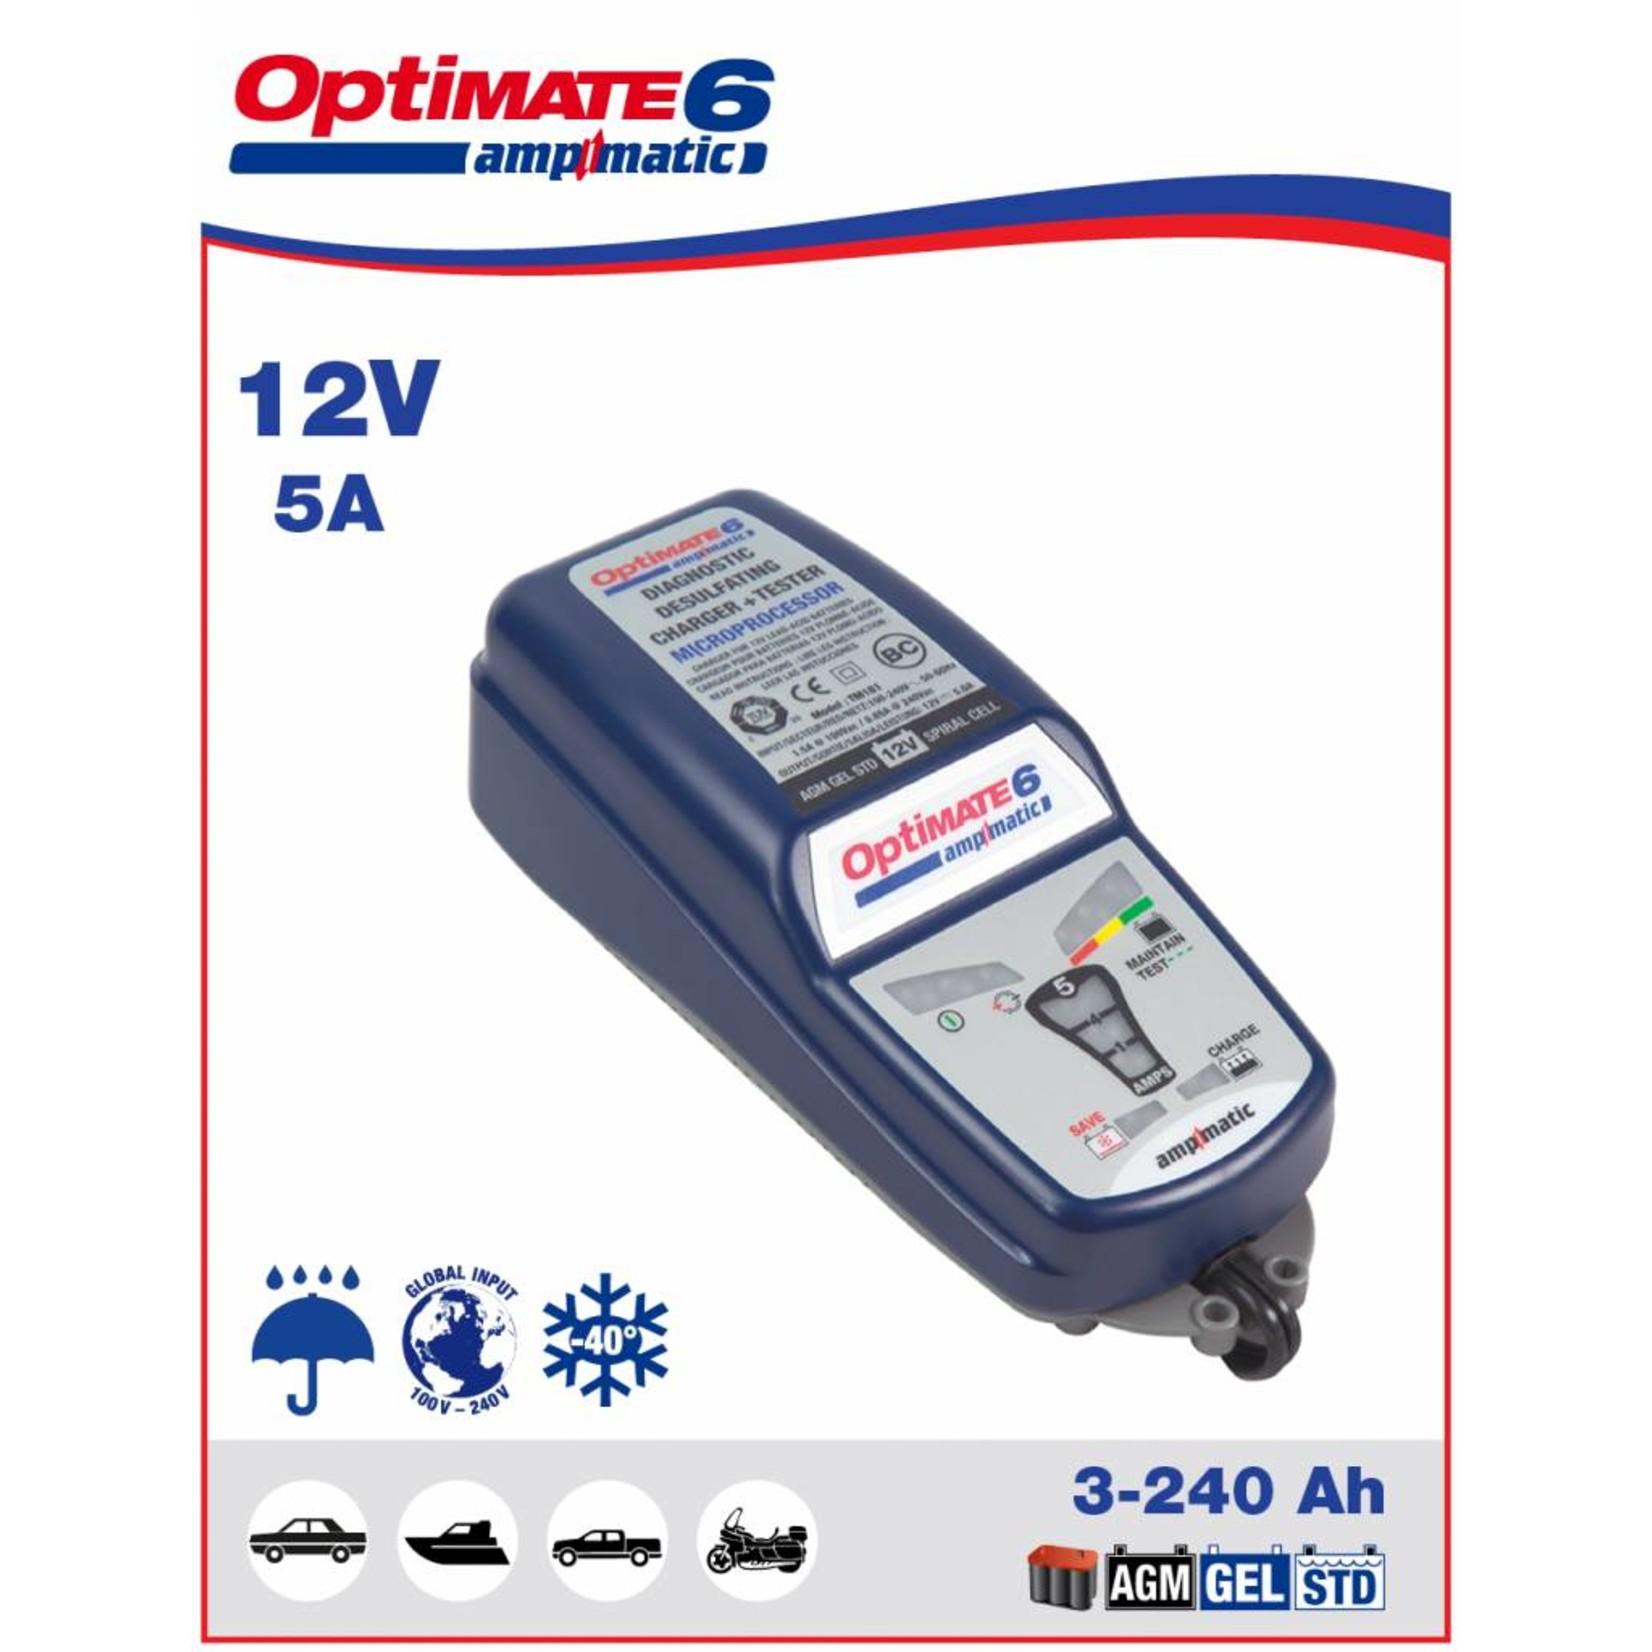 OptiMate OptiMate 6 Ampmatic - Acculader 12V